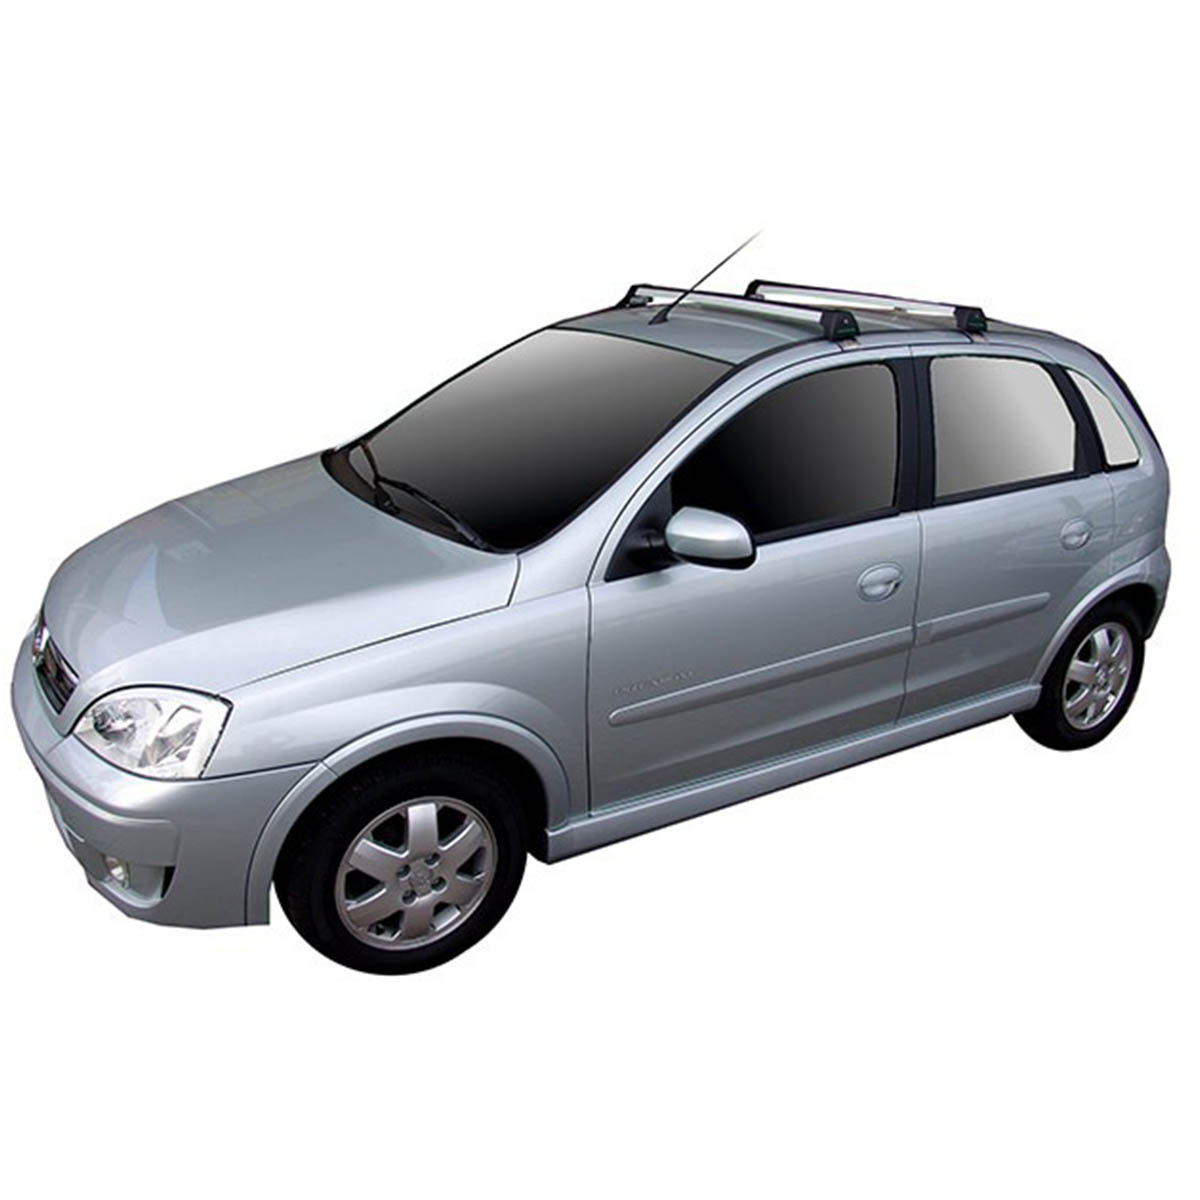 Rack de teto Long Life Sports Corsa hatch ou sedan 2004 a 2012